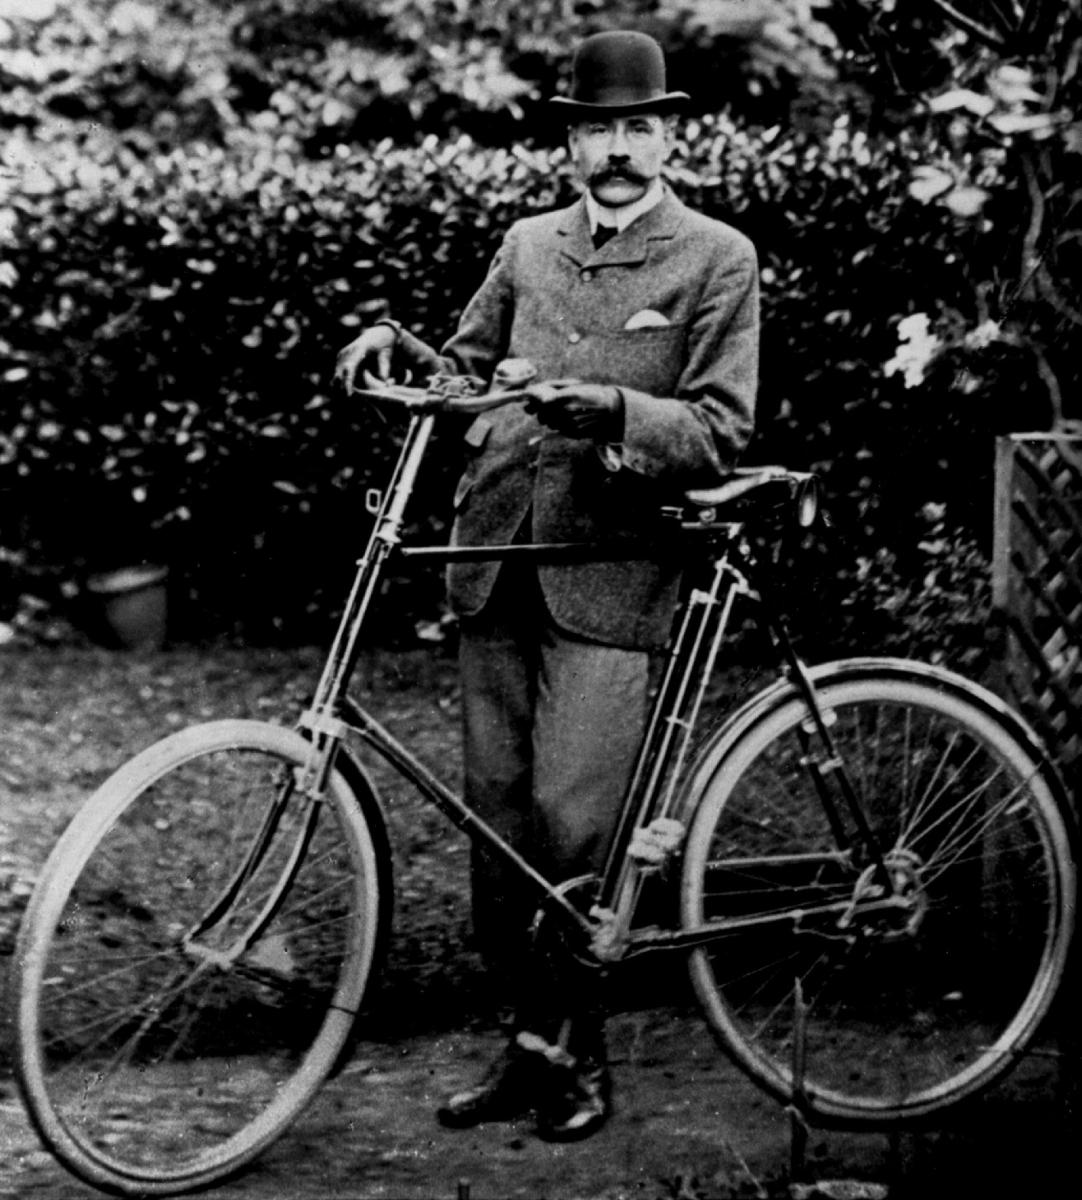 Elgar, Cycling